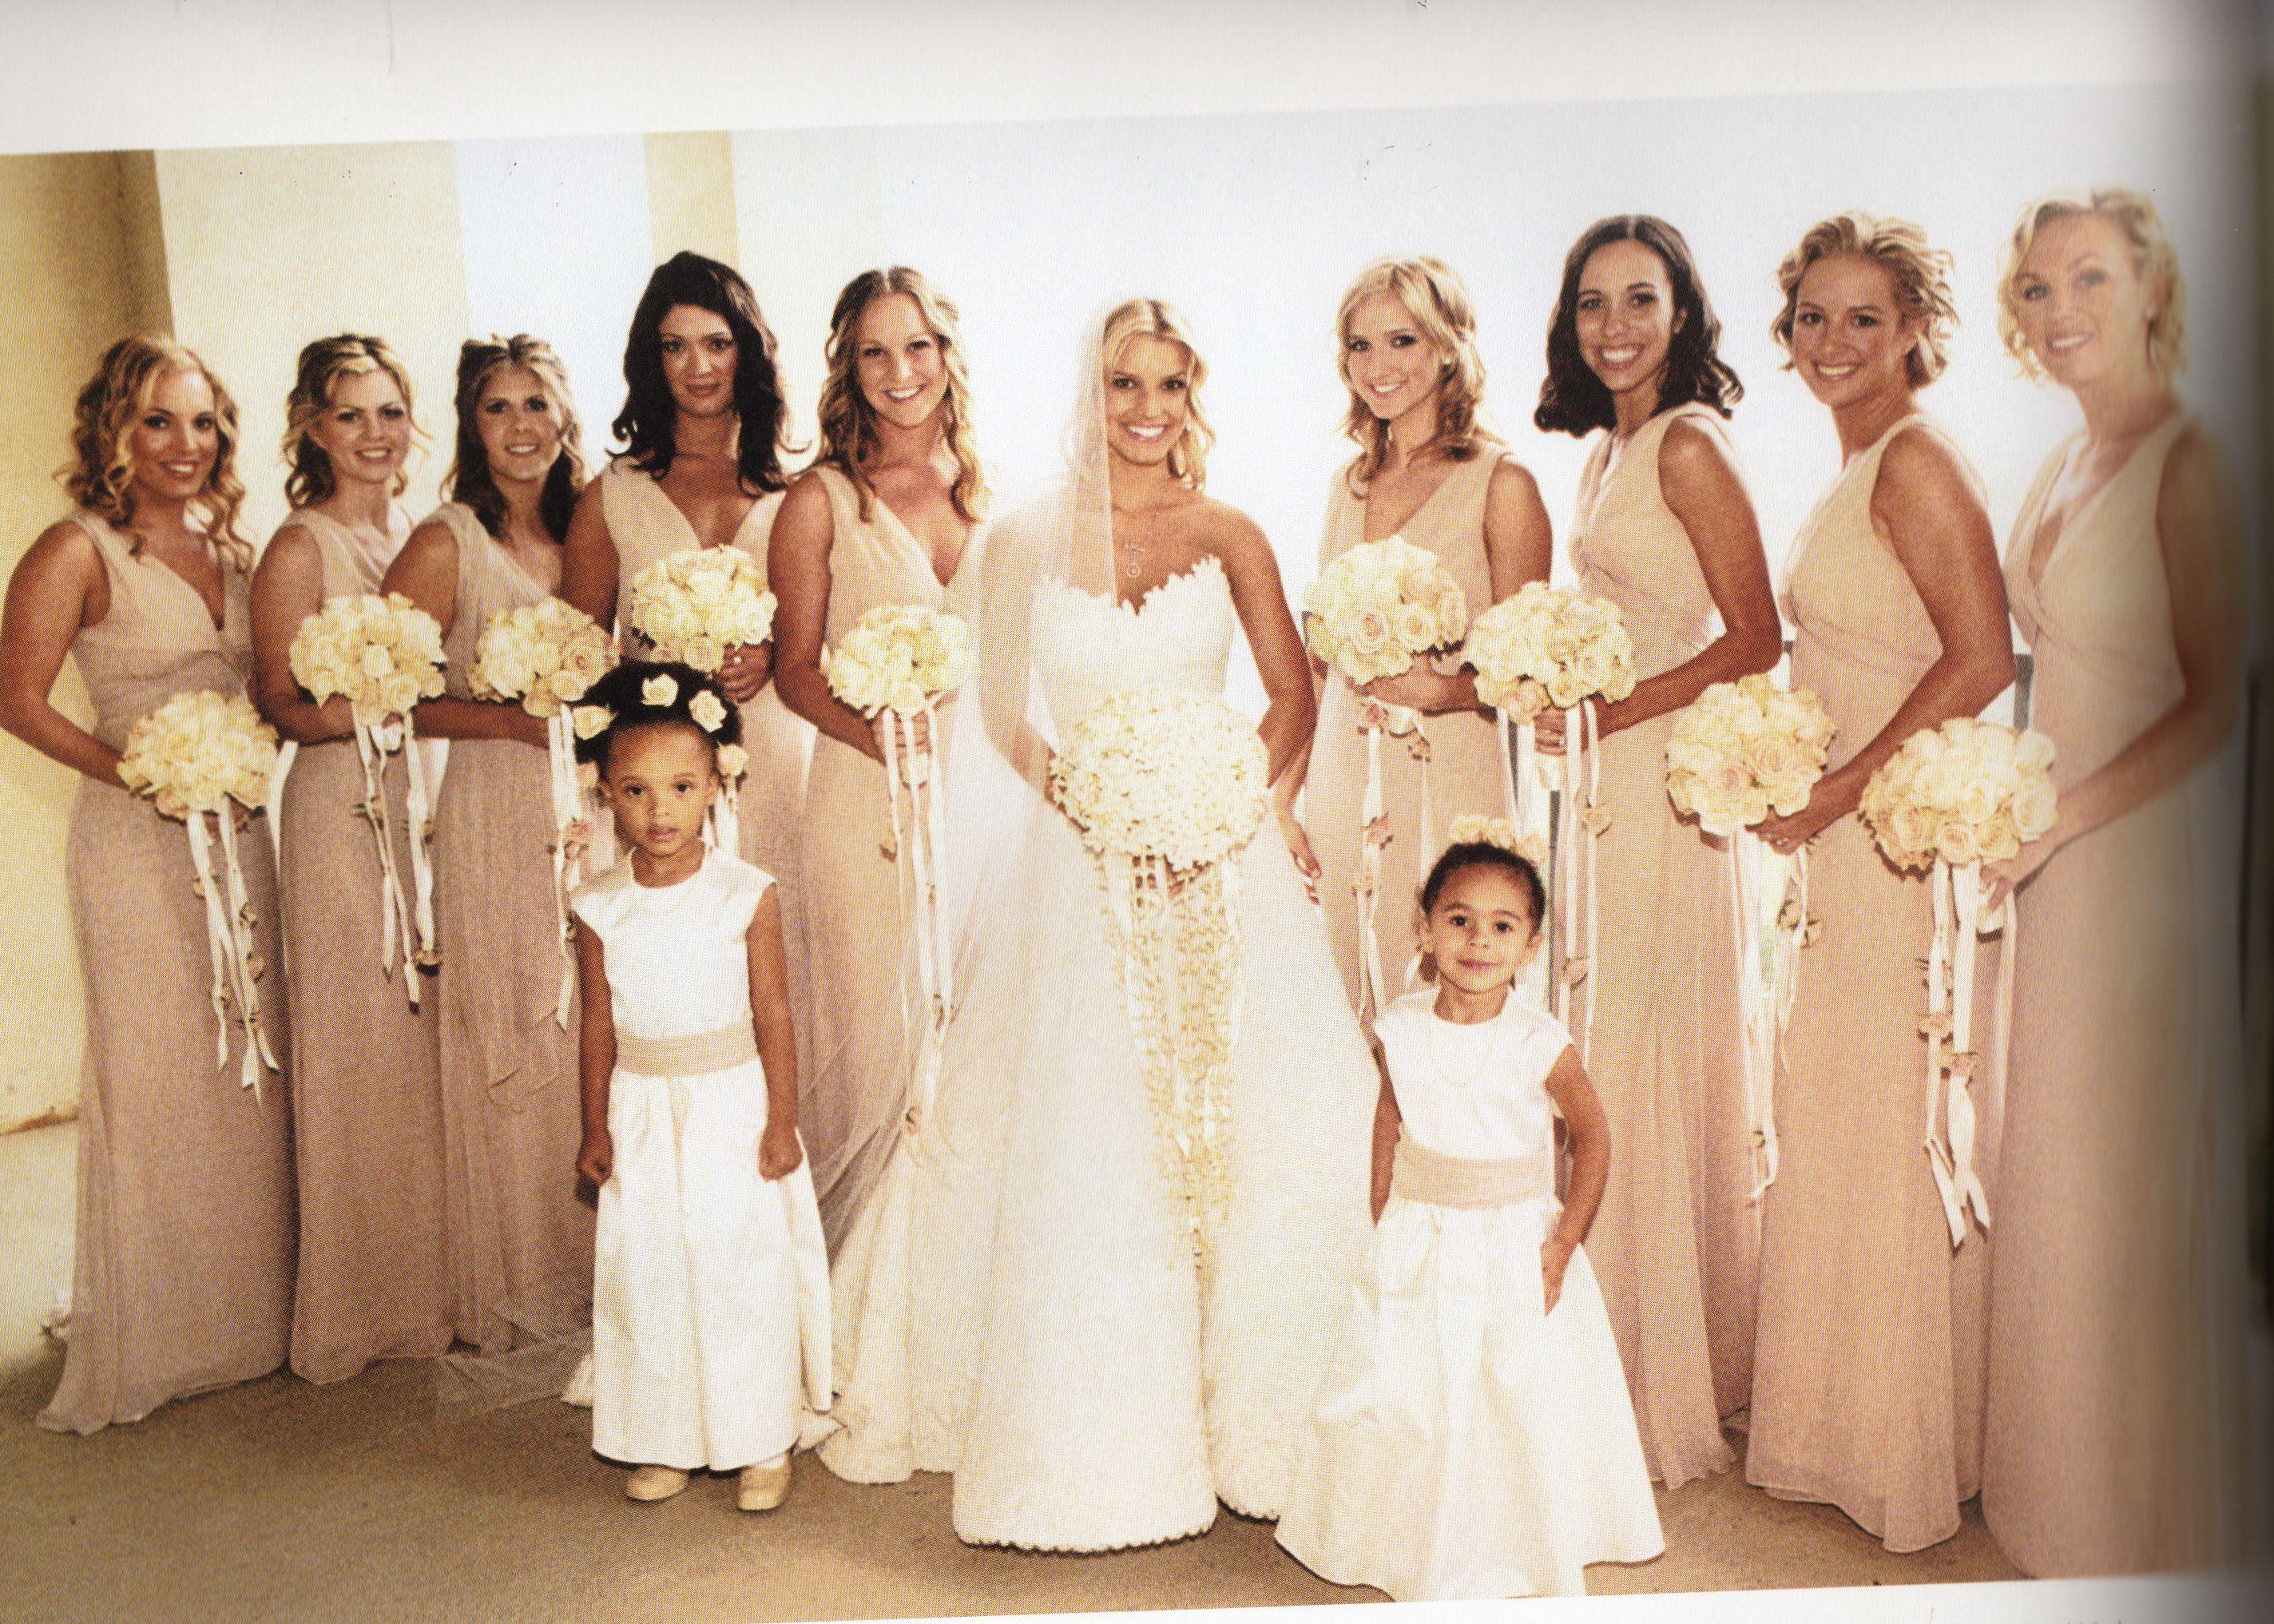 Jessica simpson wedding dress  Champagne bridesmaid dresses  One dayuc  Pinterest  Wedding